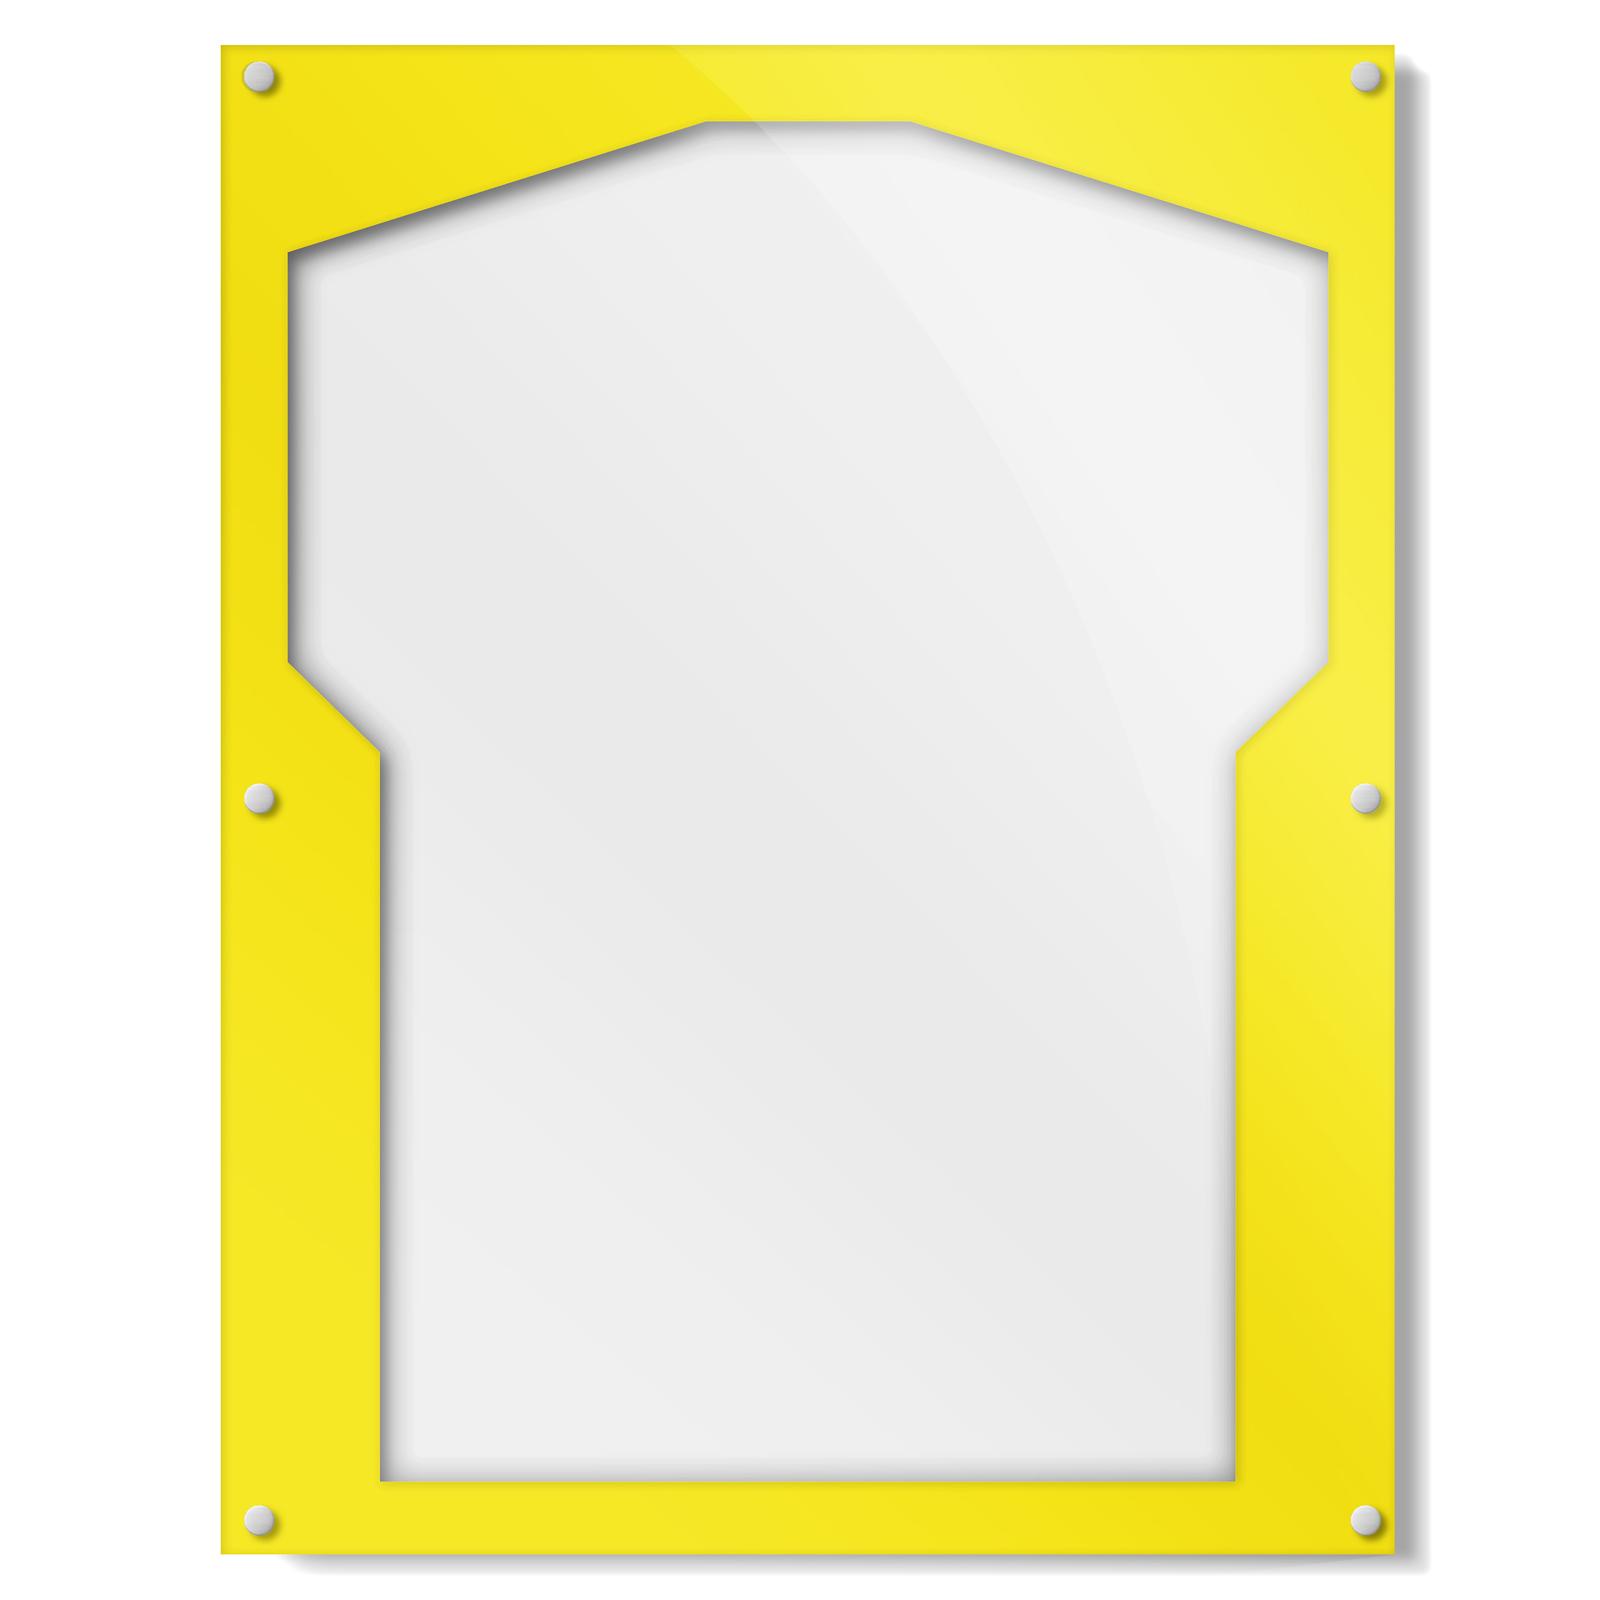 Yellow Border Shirt Frame